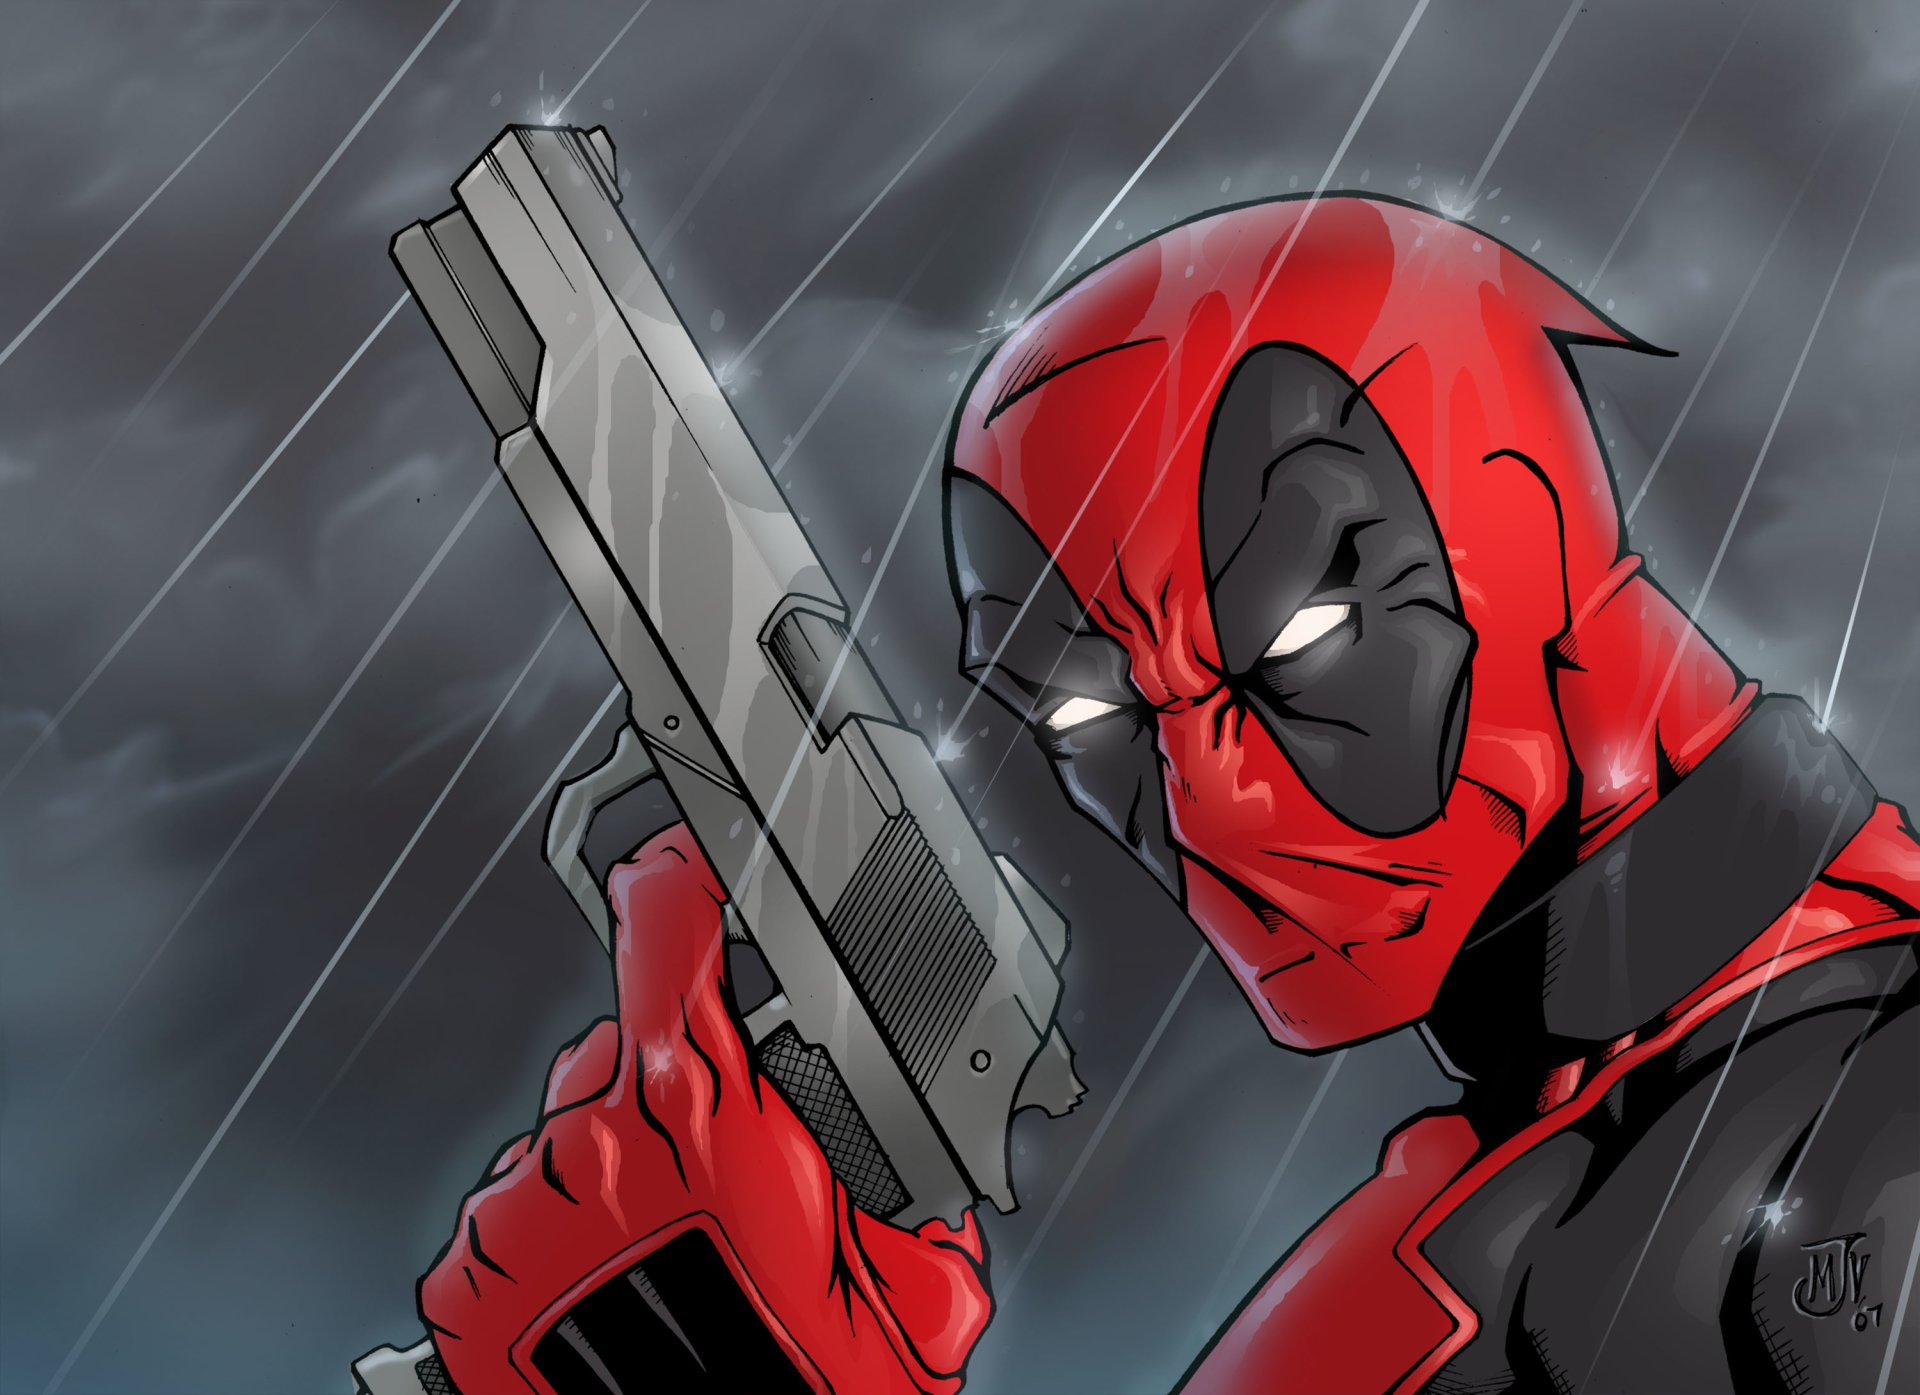 Fondos De Pantalla De Deadpool: Deadpool Fondo De Pantalla HD